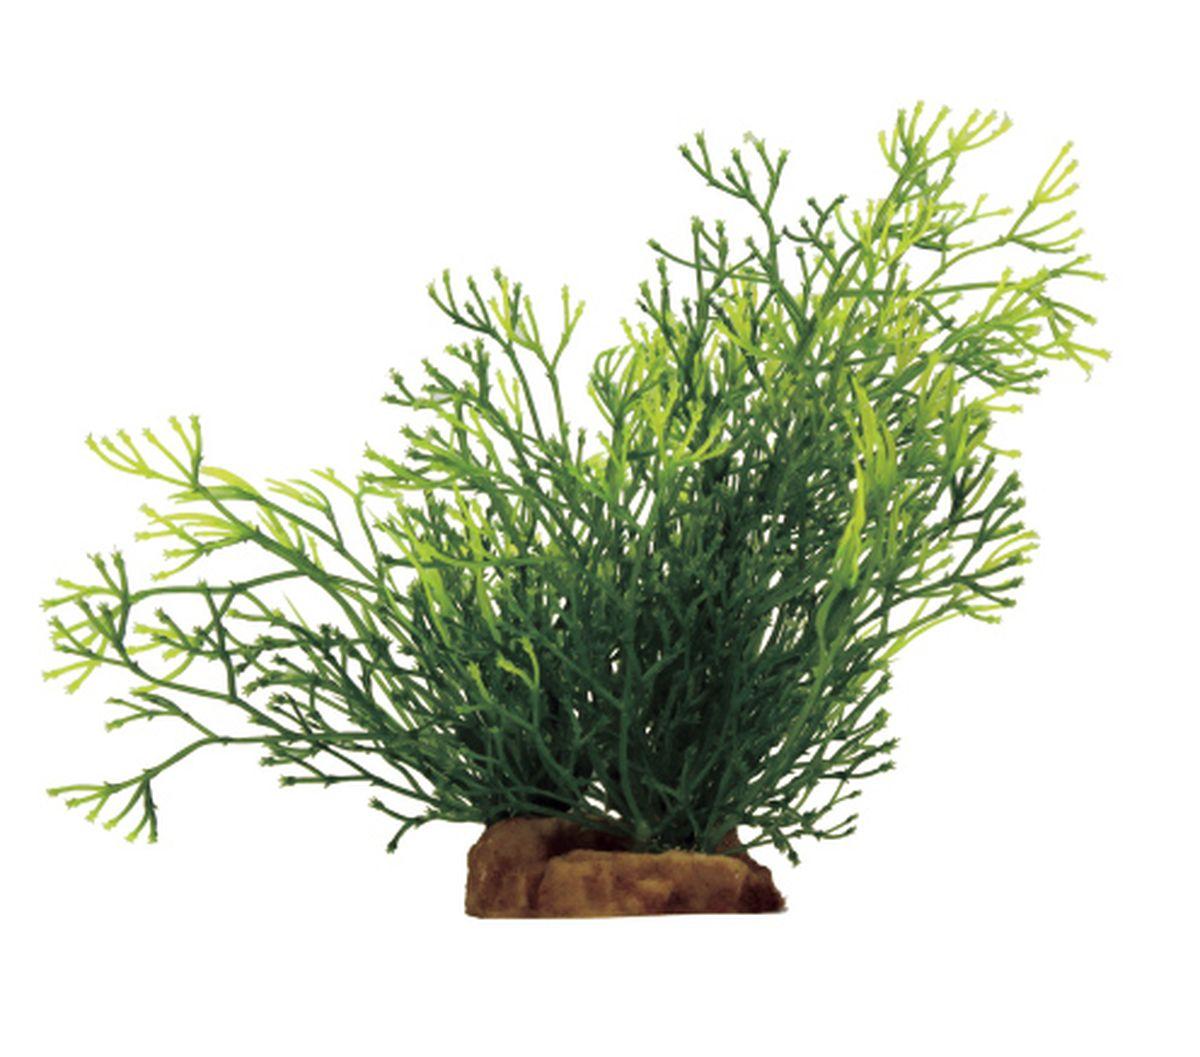 Растение для аквариума ArtUniq Блестянка, 16 x 15 x 18 смART-1130906Растение для аквариума ArtUniq Блестянка, 16 x 15 x 18 см